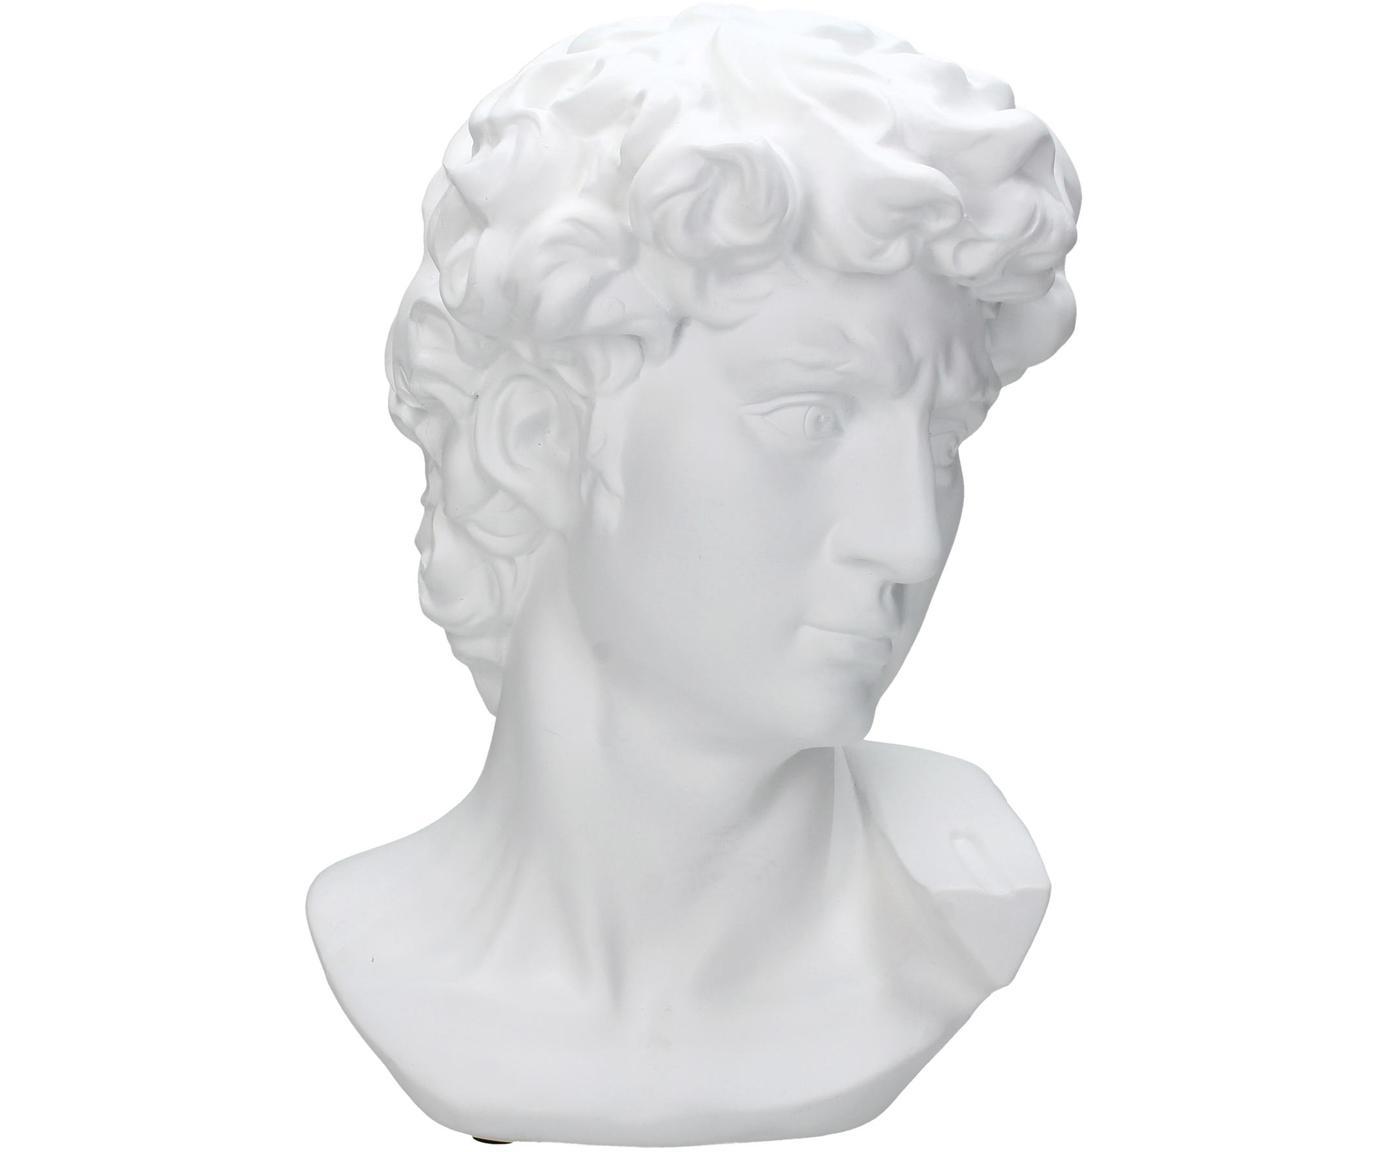 Deko-Objekt David, Polyresin, Weiß, 21 x 29 cm